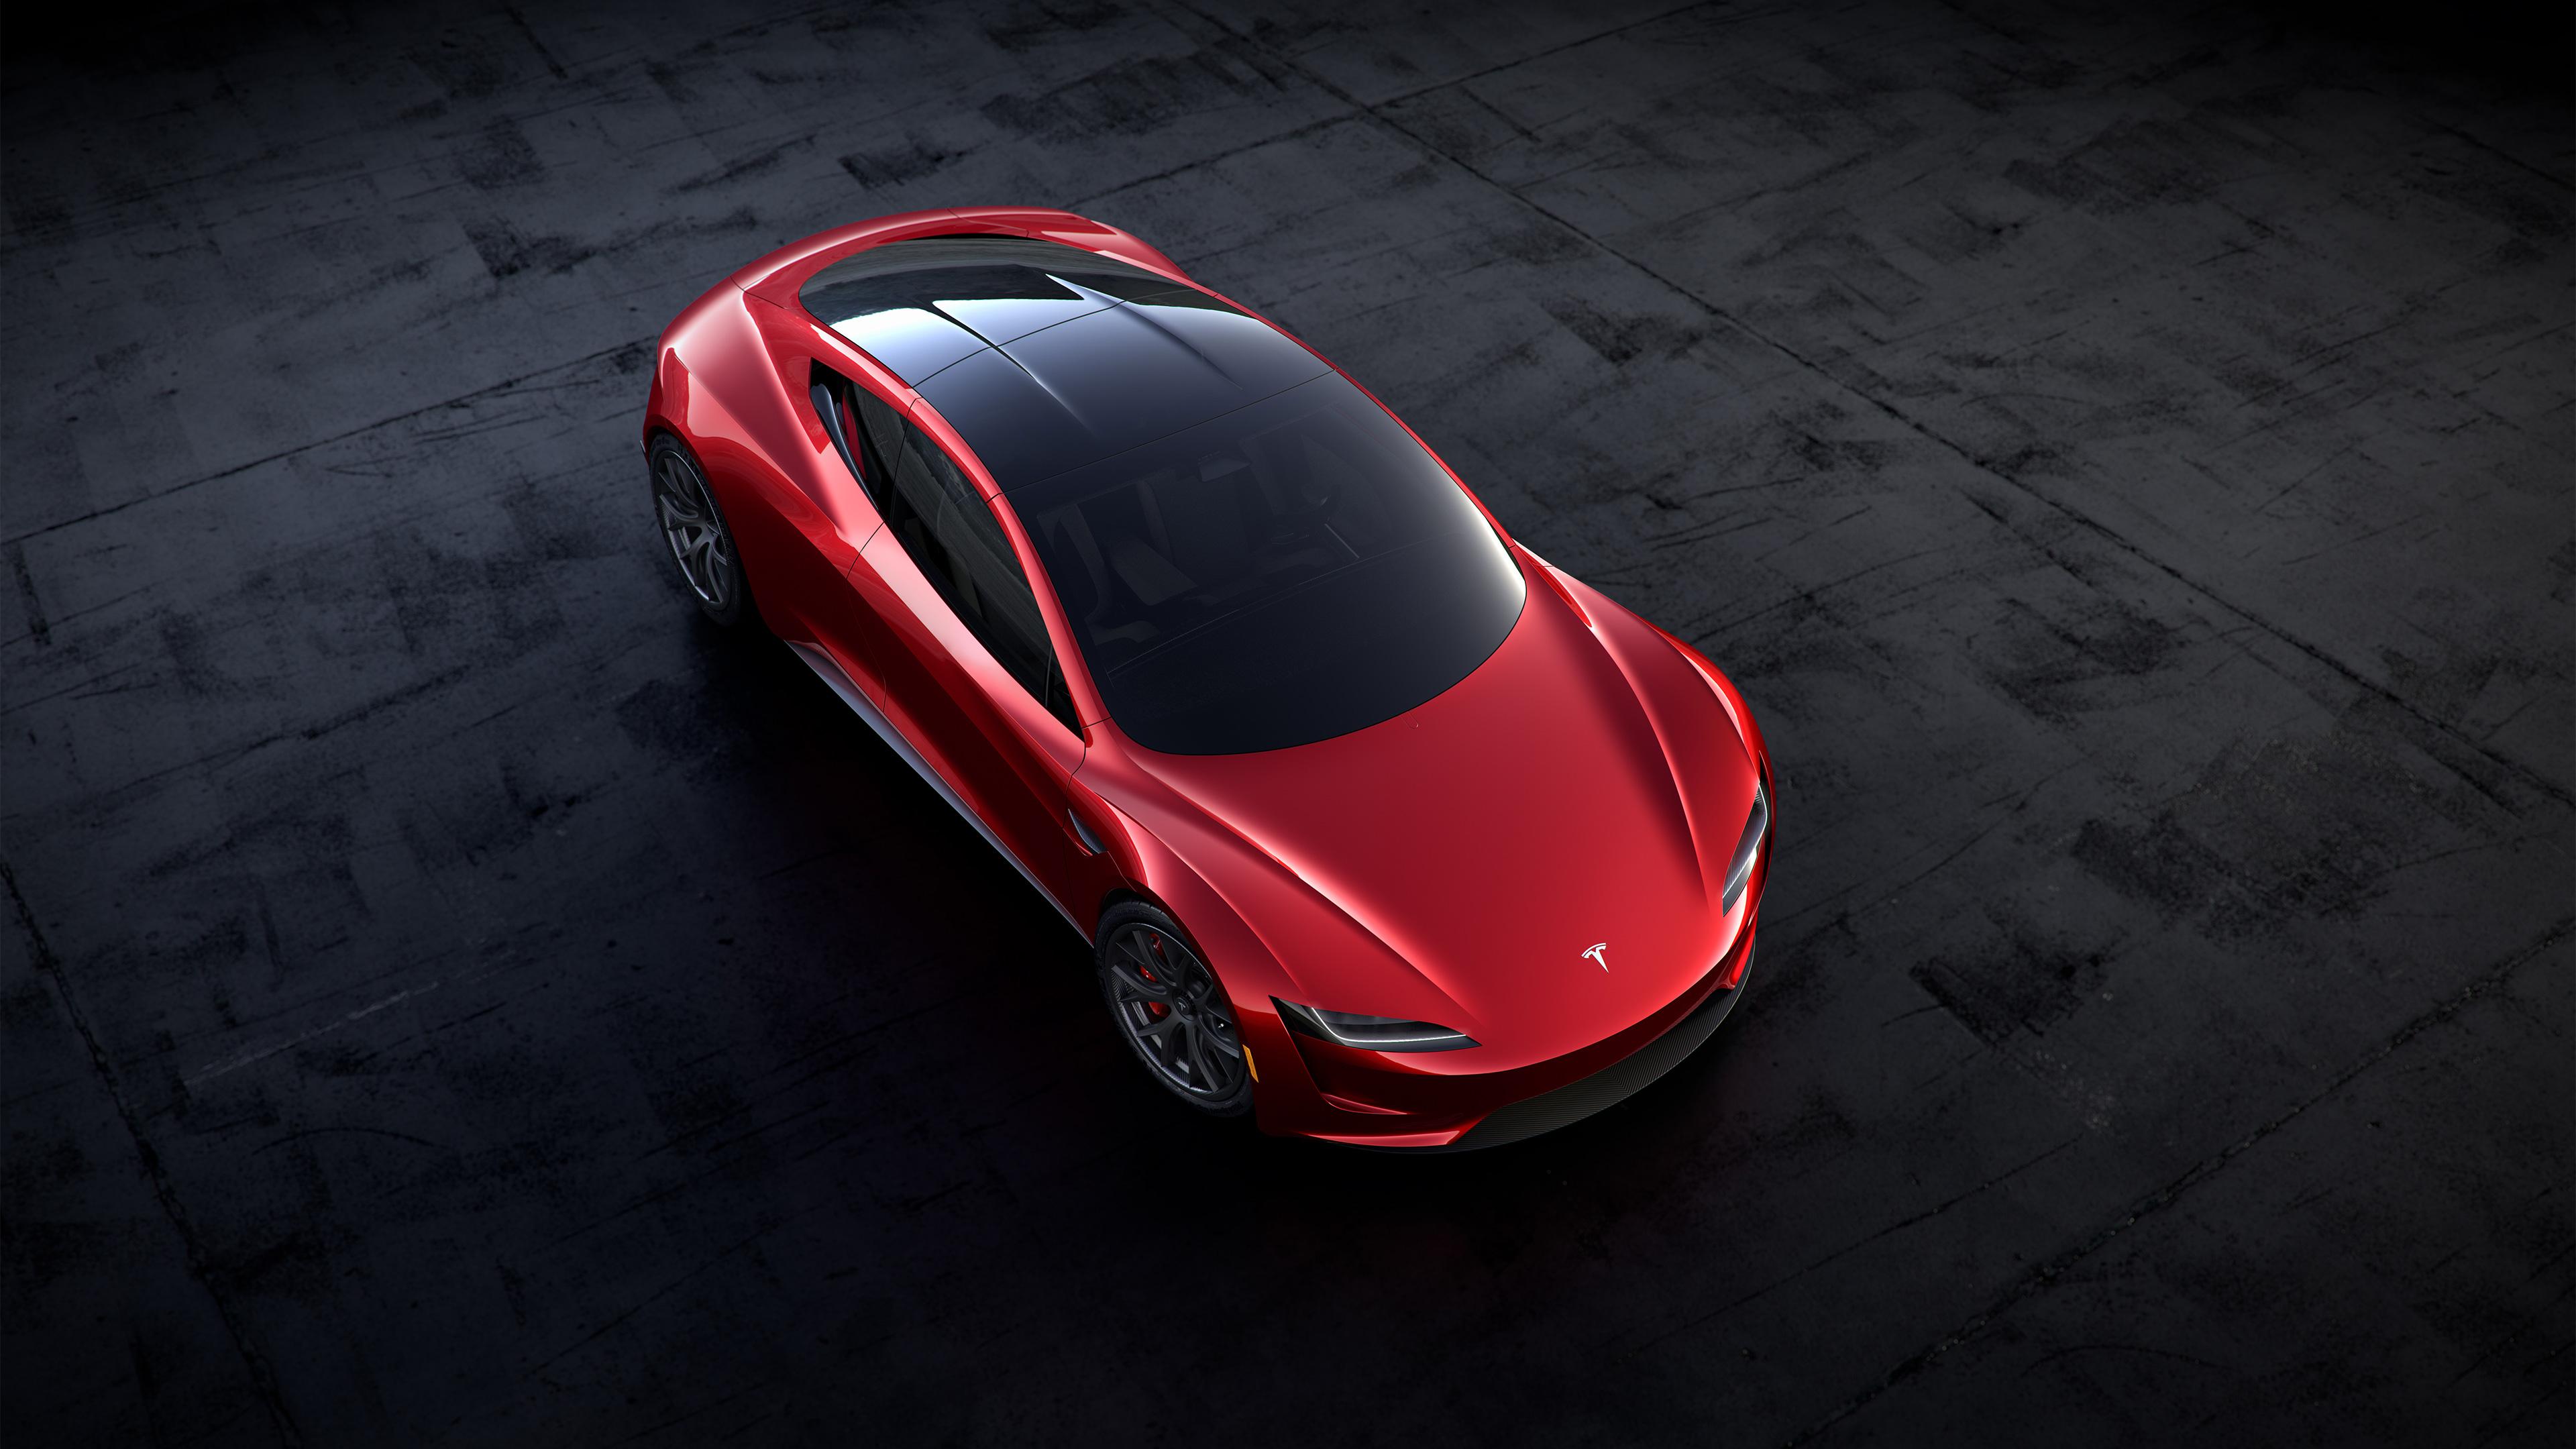 tesla roadster 2018 1539108017 - Tesla Roadster 2018 - tesla wallpapers, tesla roadster wallpapers, hd-wallpapers, electric cars wallpapers, 4k-wallpapers, 2018 cars wallpapers